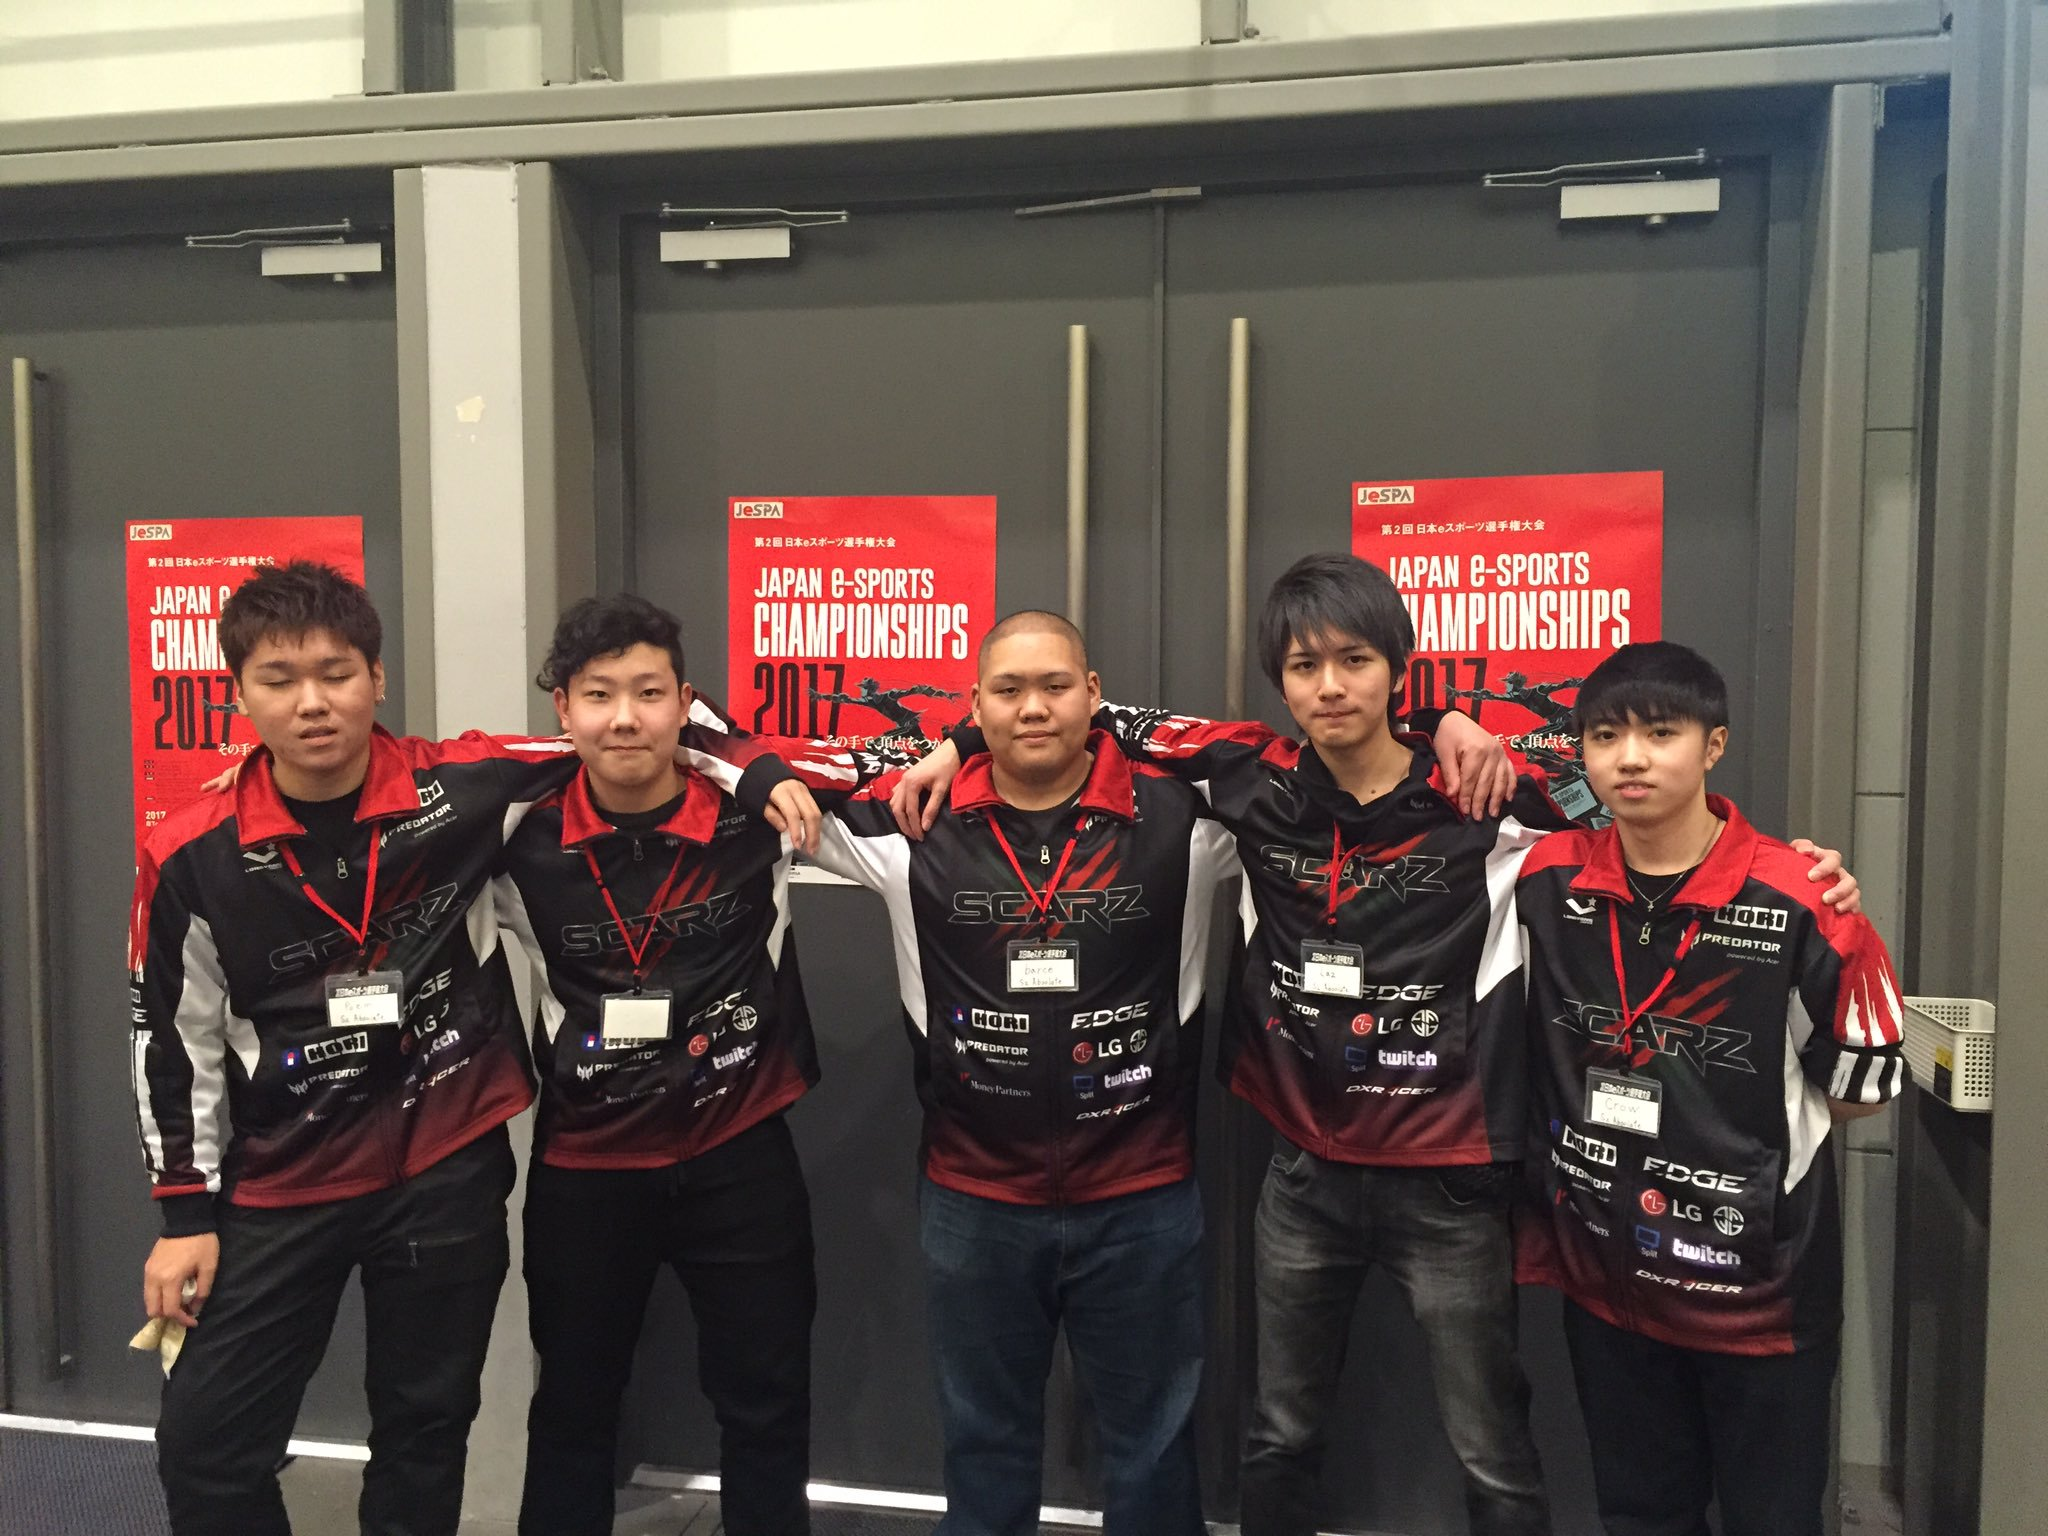 sz-absolute-japanese-team